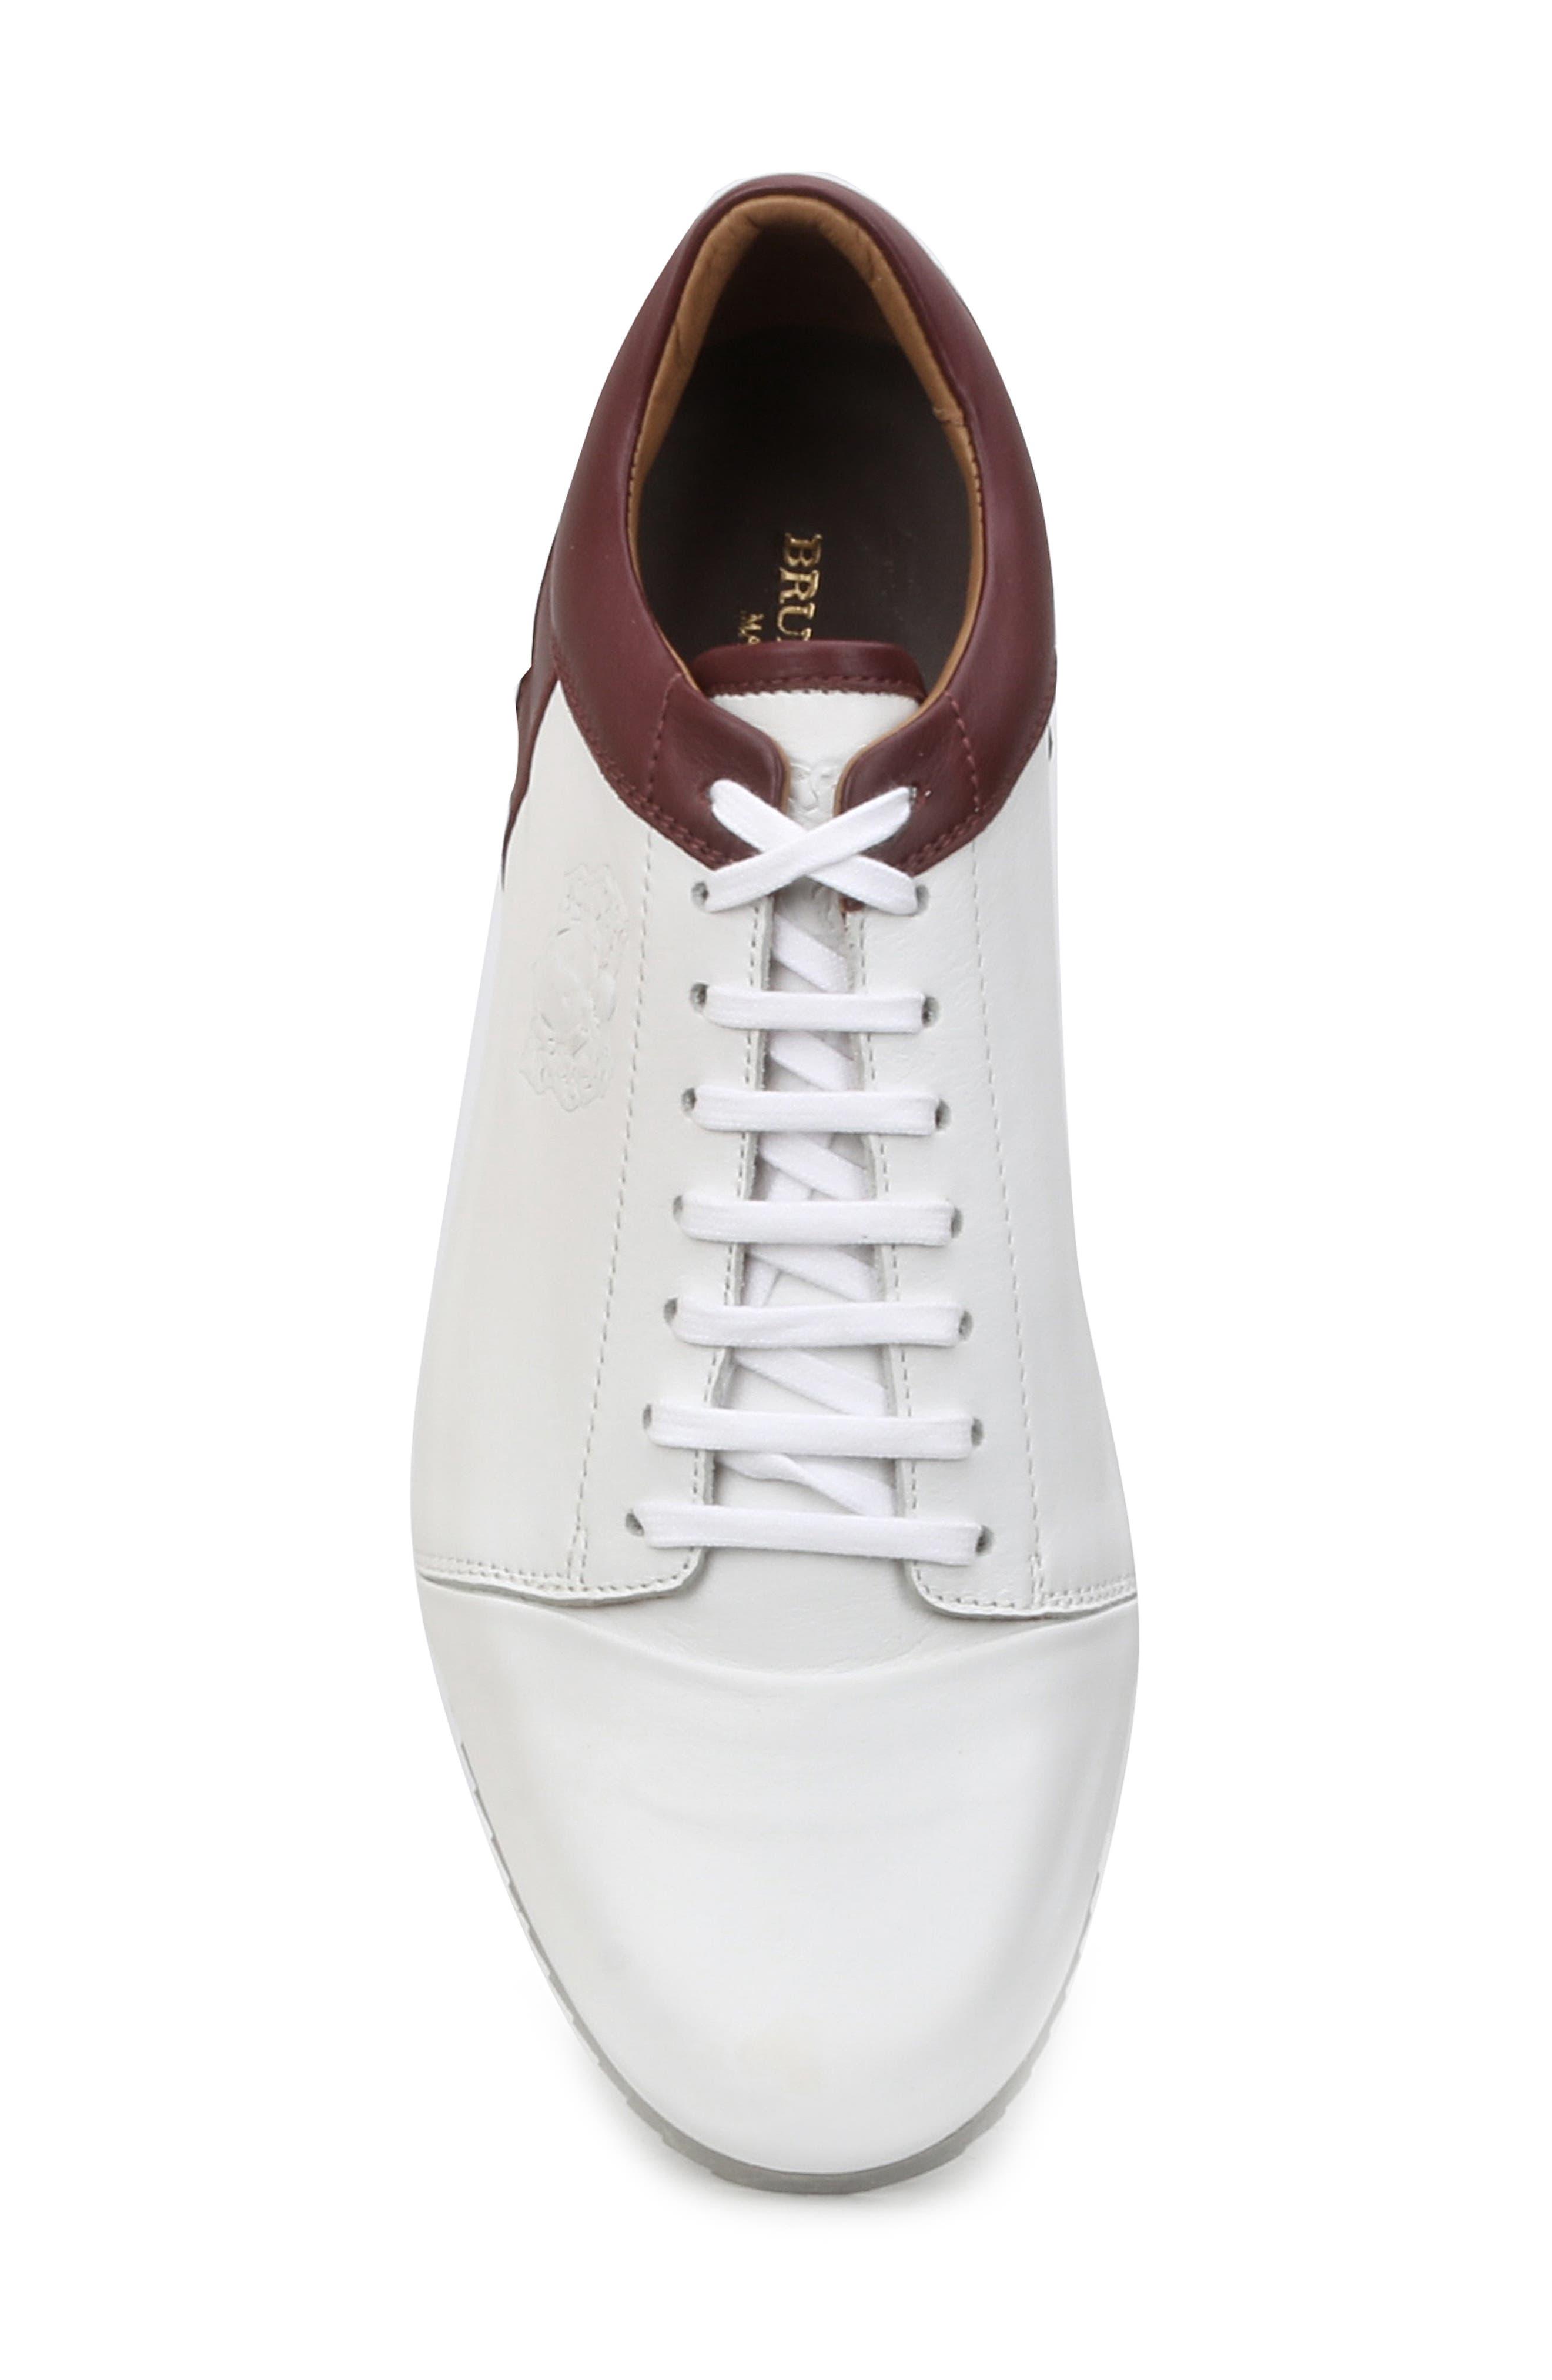 Santana Sneaker,                             Alternate thumbnail 5, color,                             WHITE/ BORDEAUX